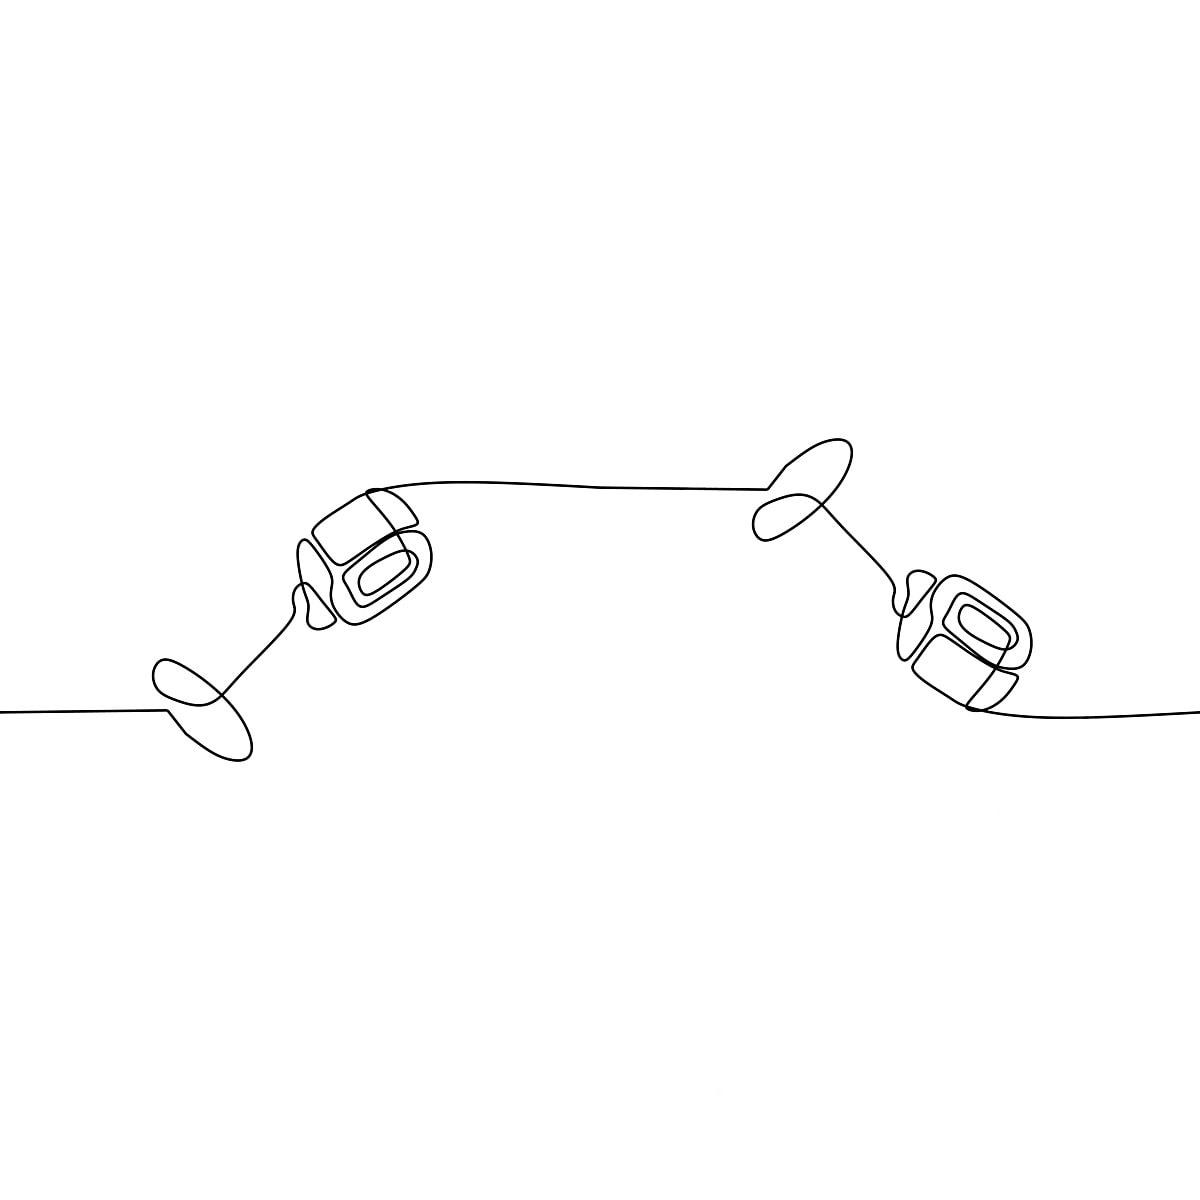 Cute Micrófono Continua Una Linea De Silueta Clipart Dibujado A Mano